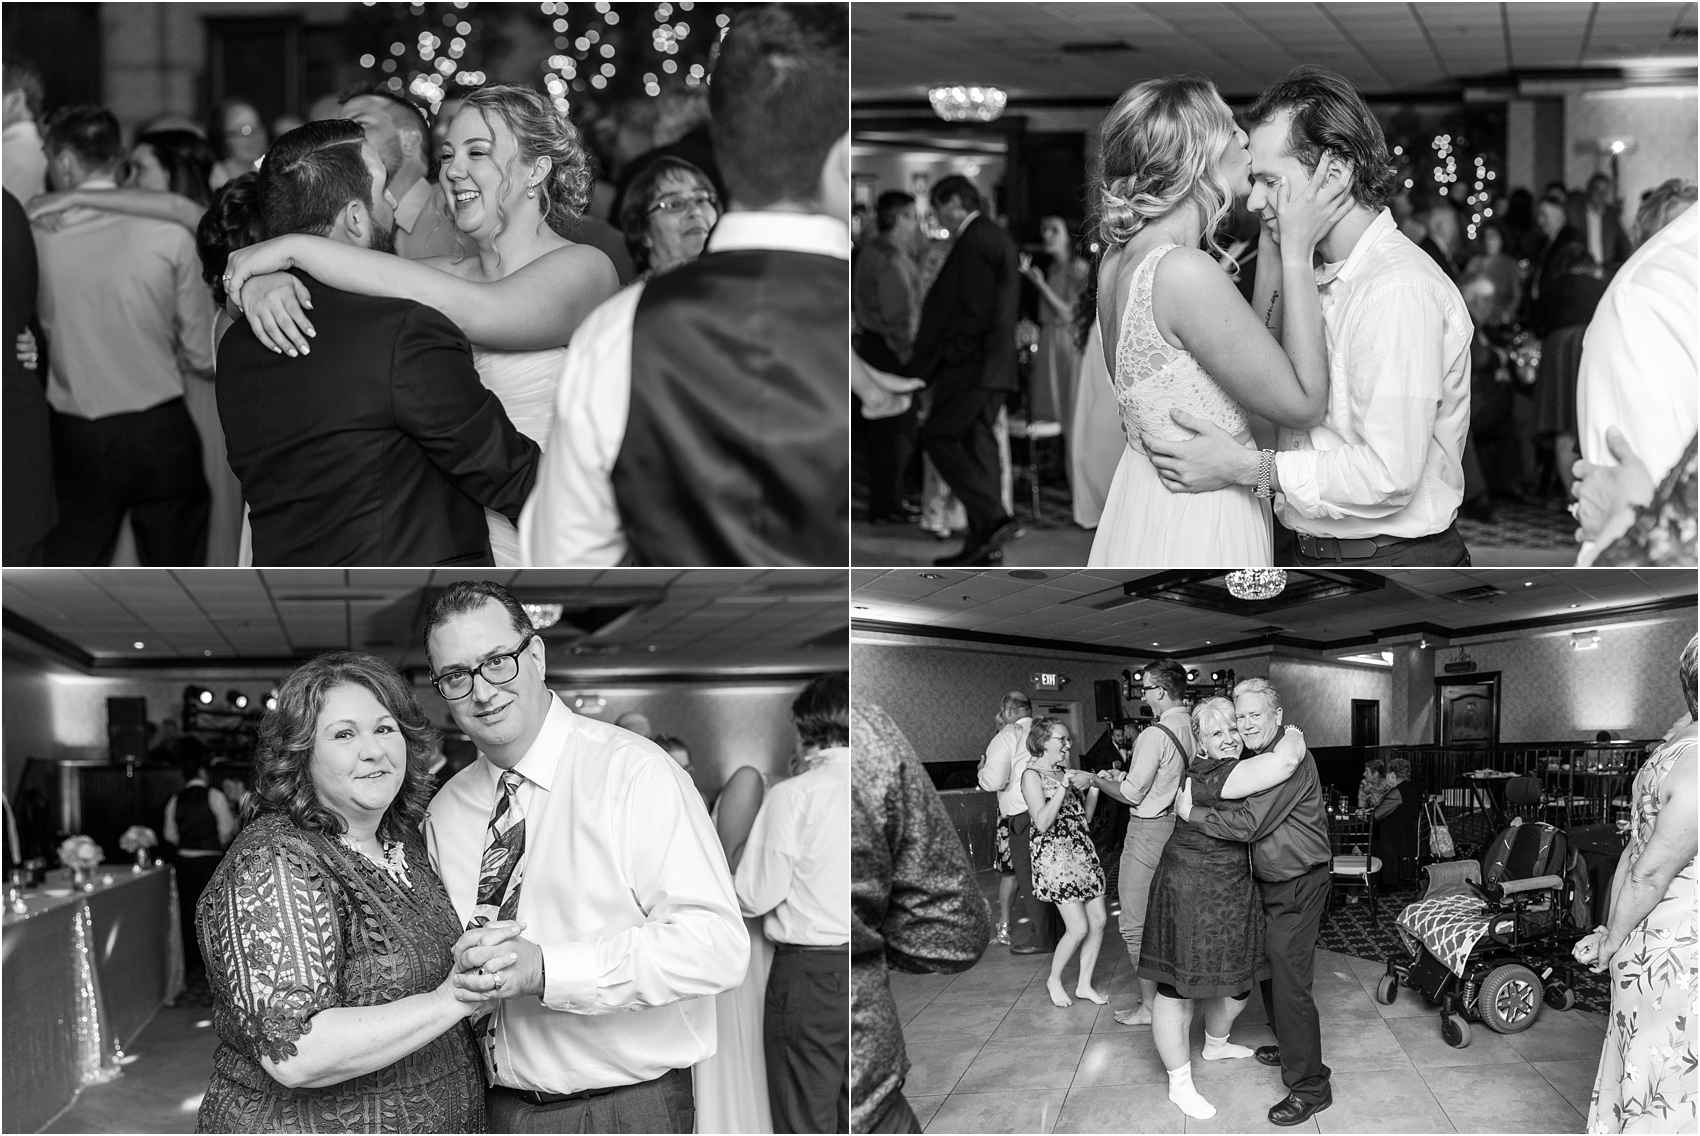 joyful-and-candid-navy-blush-wedding-photos-at-crystal-gardens-in-howell-mi-by-courtney-carolyn-photography_0122.jpg